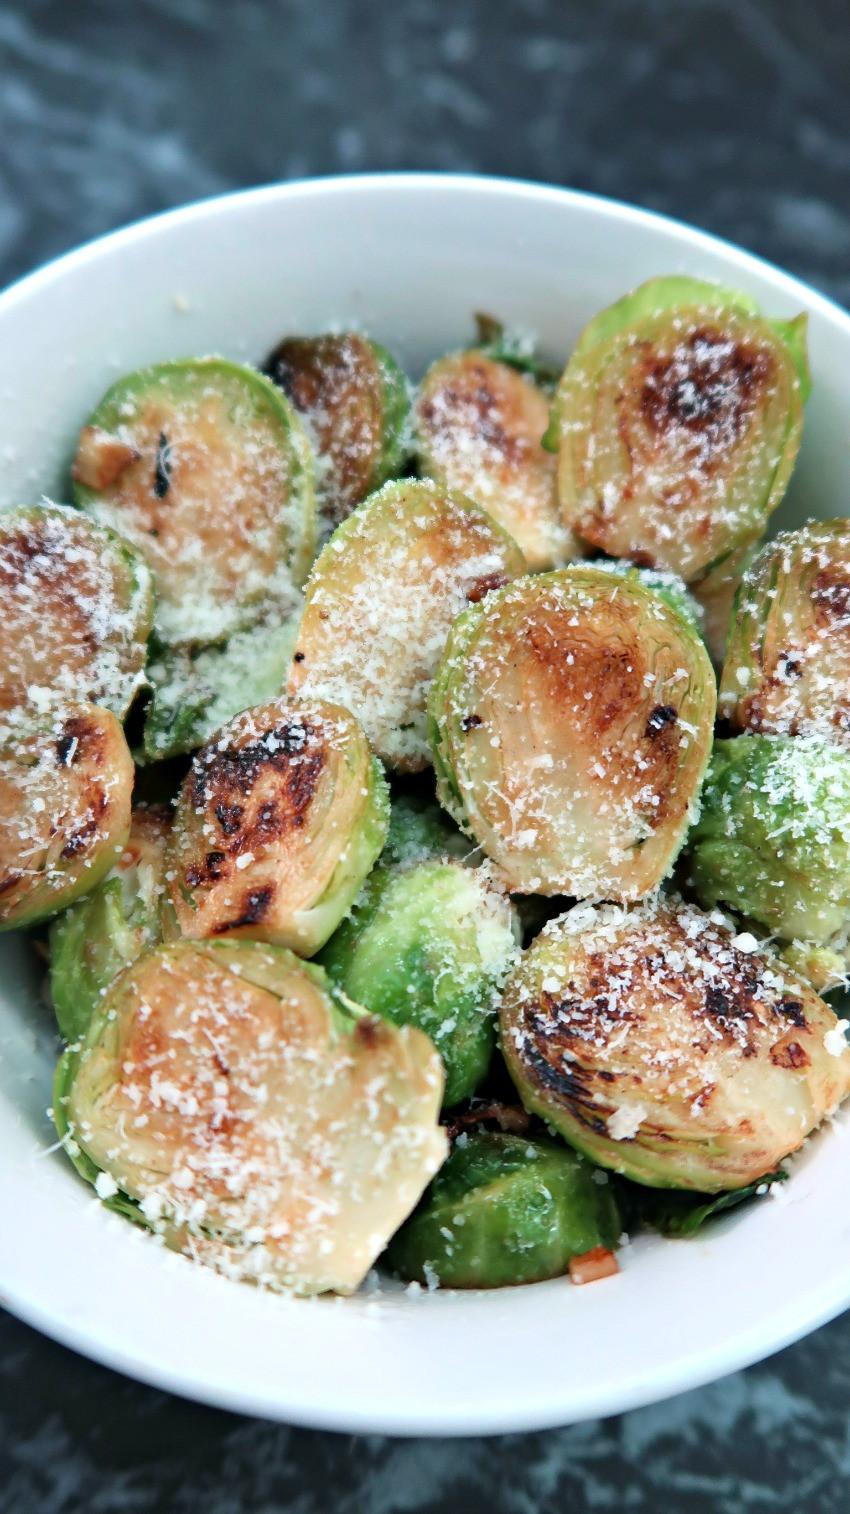 Free Keto Diet Recipes  30 Keto Diet Recipes Easy Low Carb & Ketogenic Diet Ideas